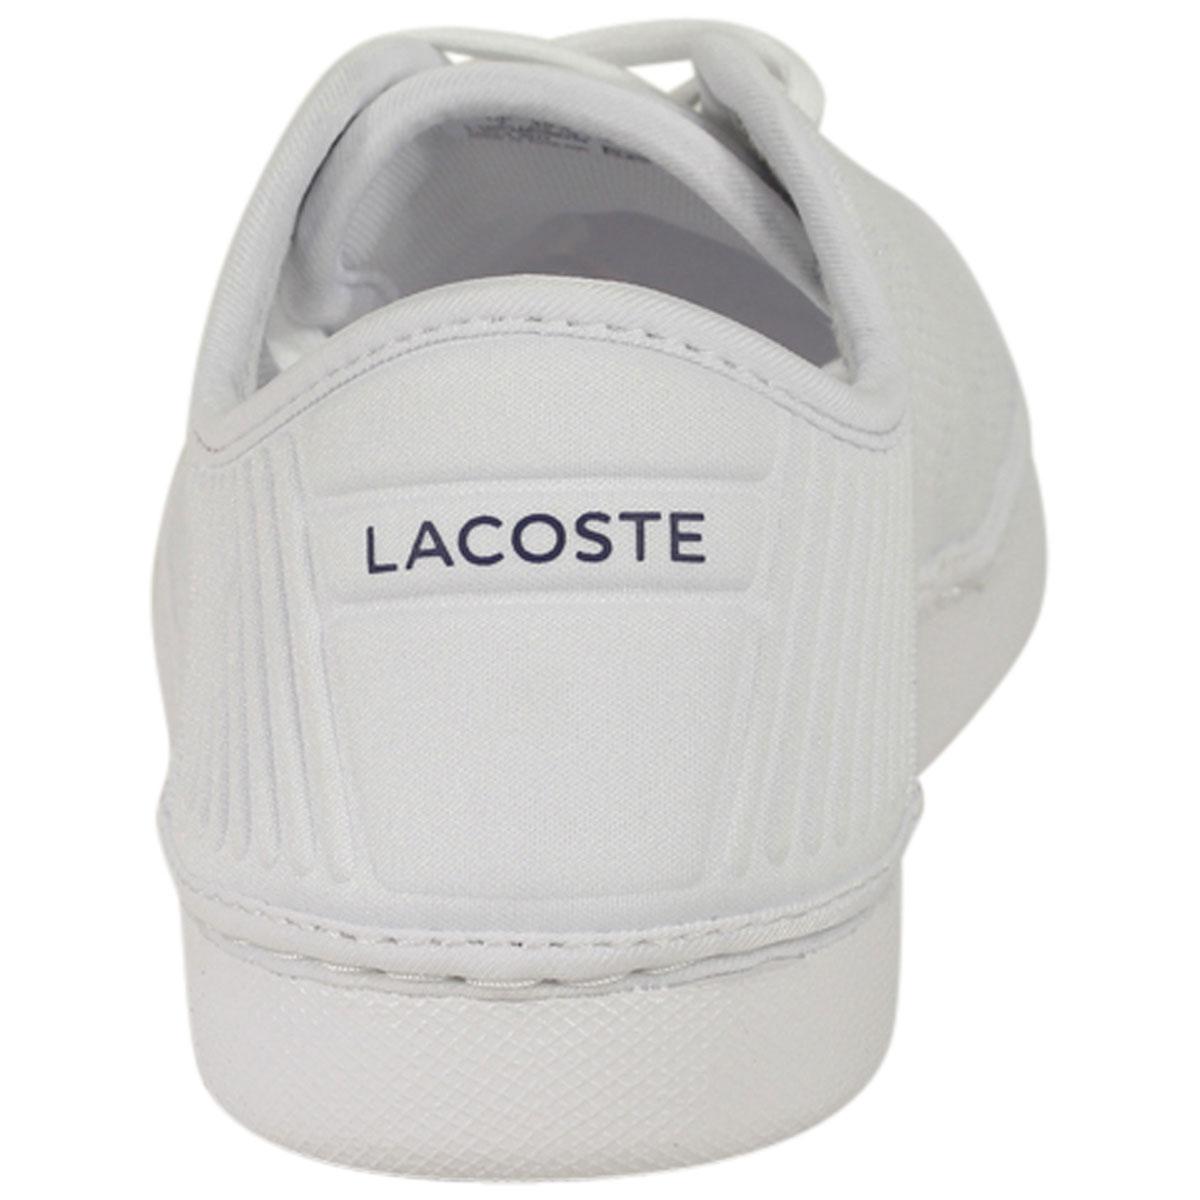 Lacoste-Men-039-s-L-Ydro-Lace-118-Trainers-Sneakers-Shoes thumbnail 24